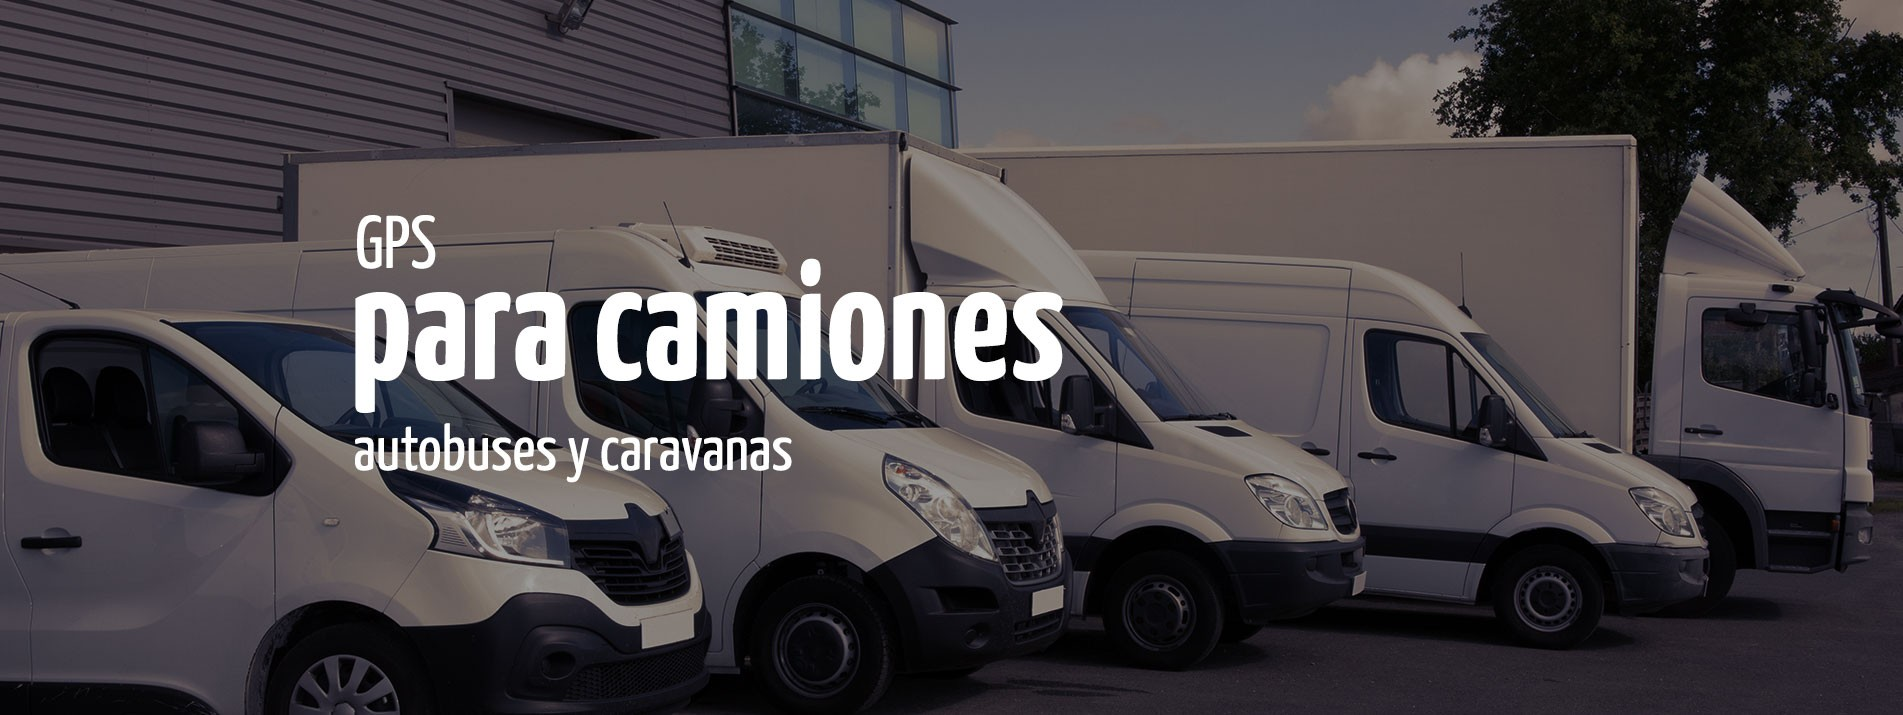 gps-camion-caravana